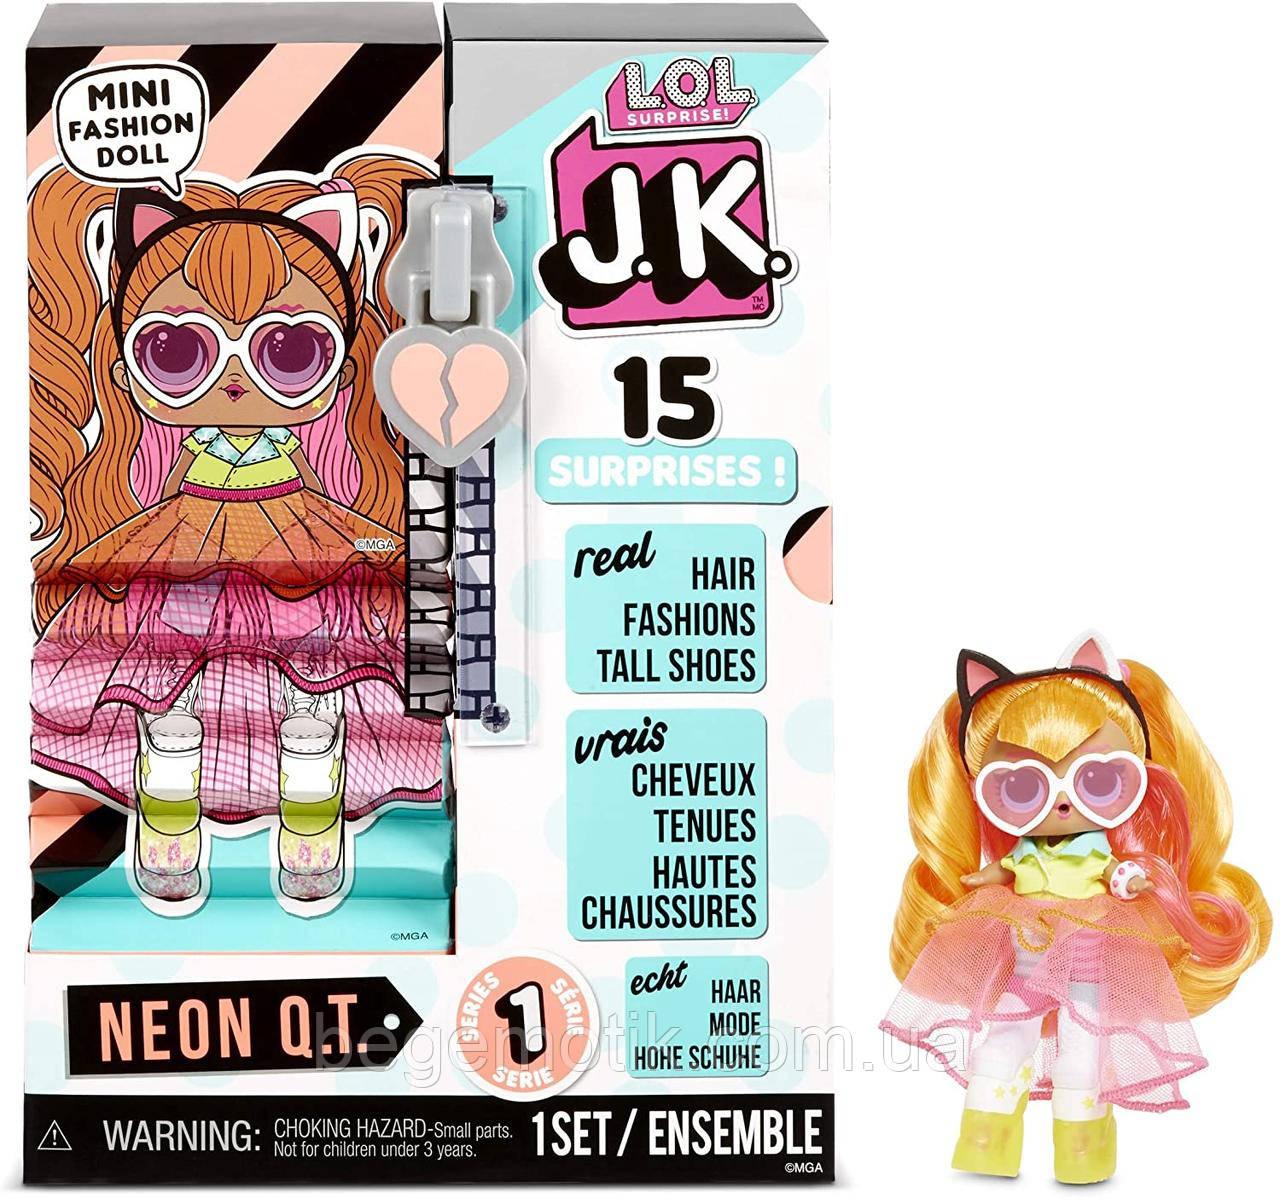 "Игровой набор с куклой L.O.L. SURPRISE! серии ""J.K."" - Леди Неон JK Neon Q.T. Mini Fashion Doll"